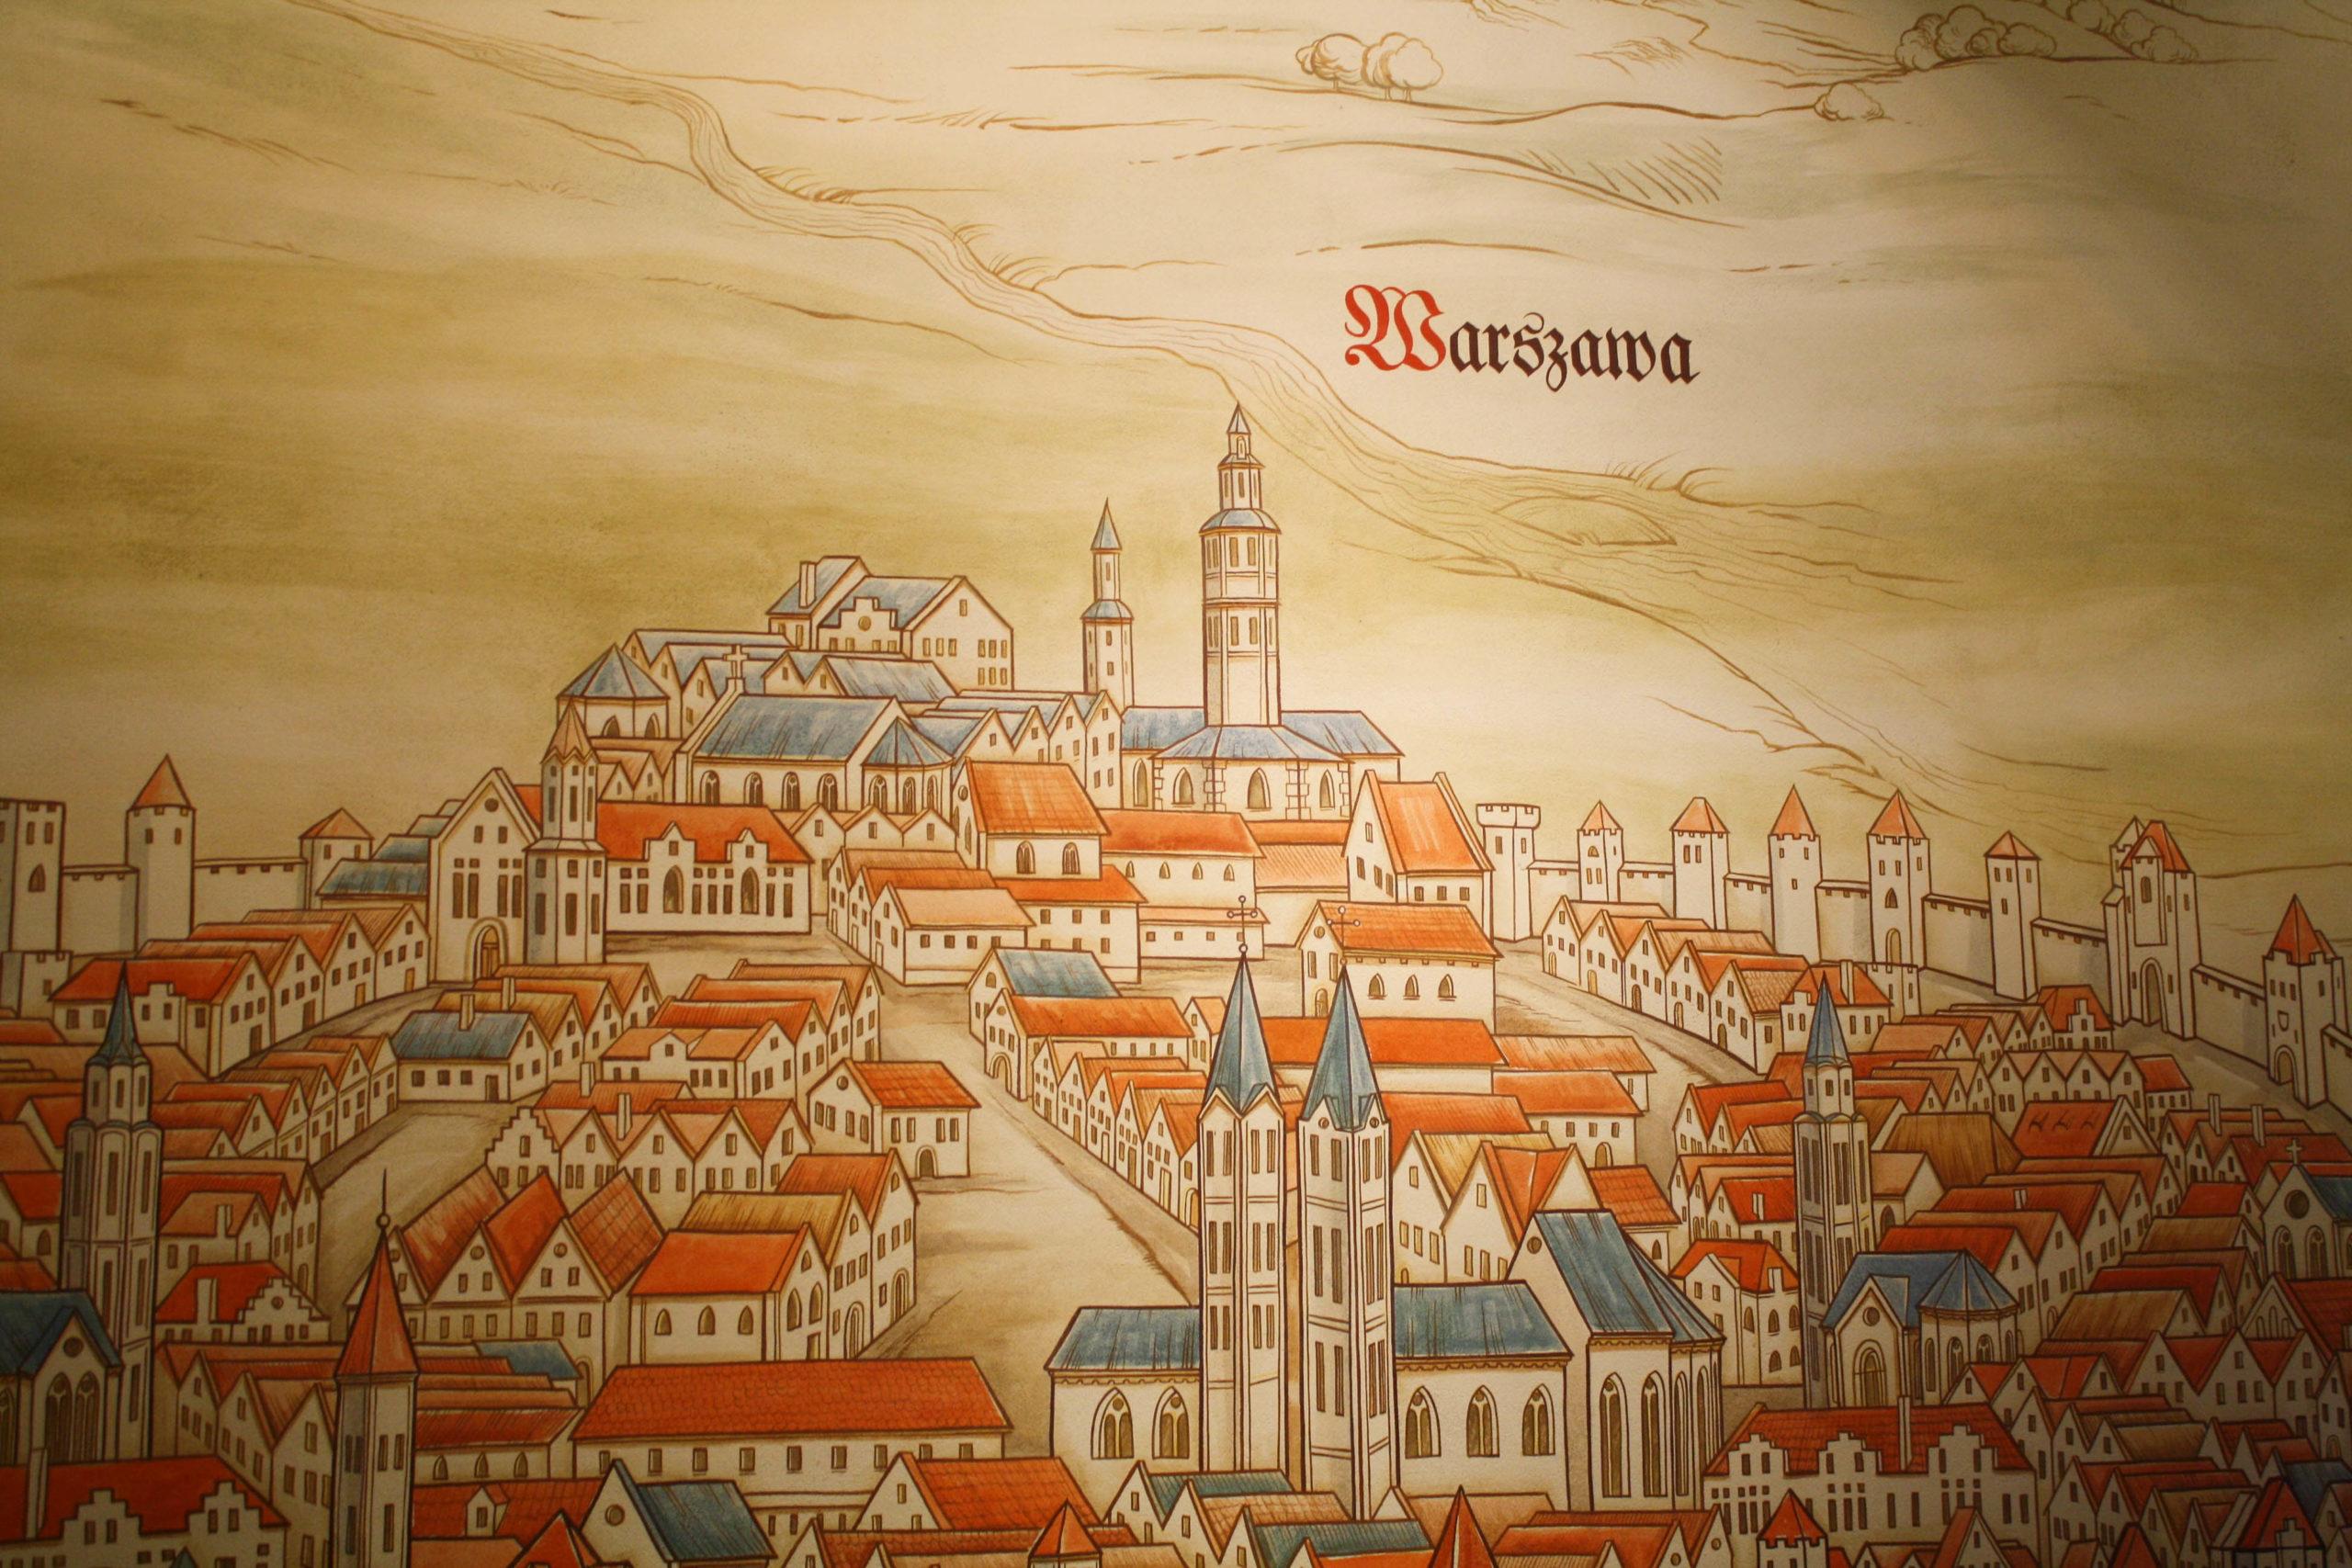 Illustration of historic Warsaw